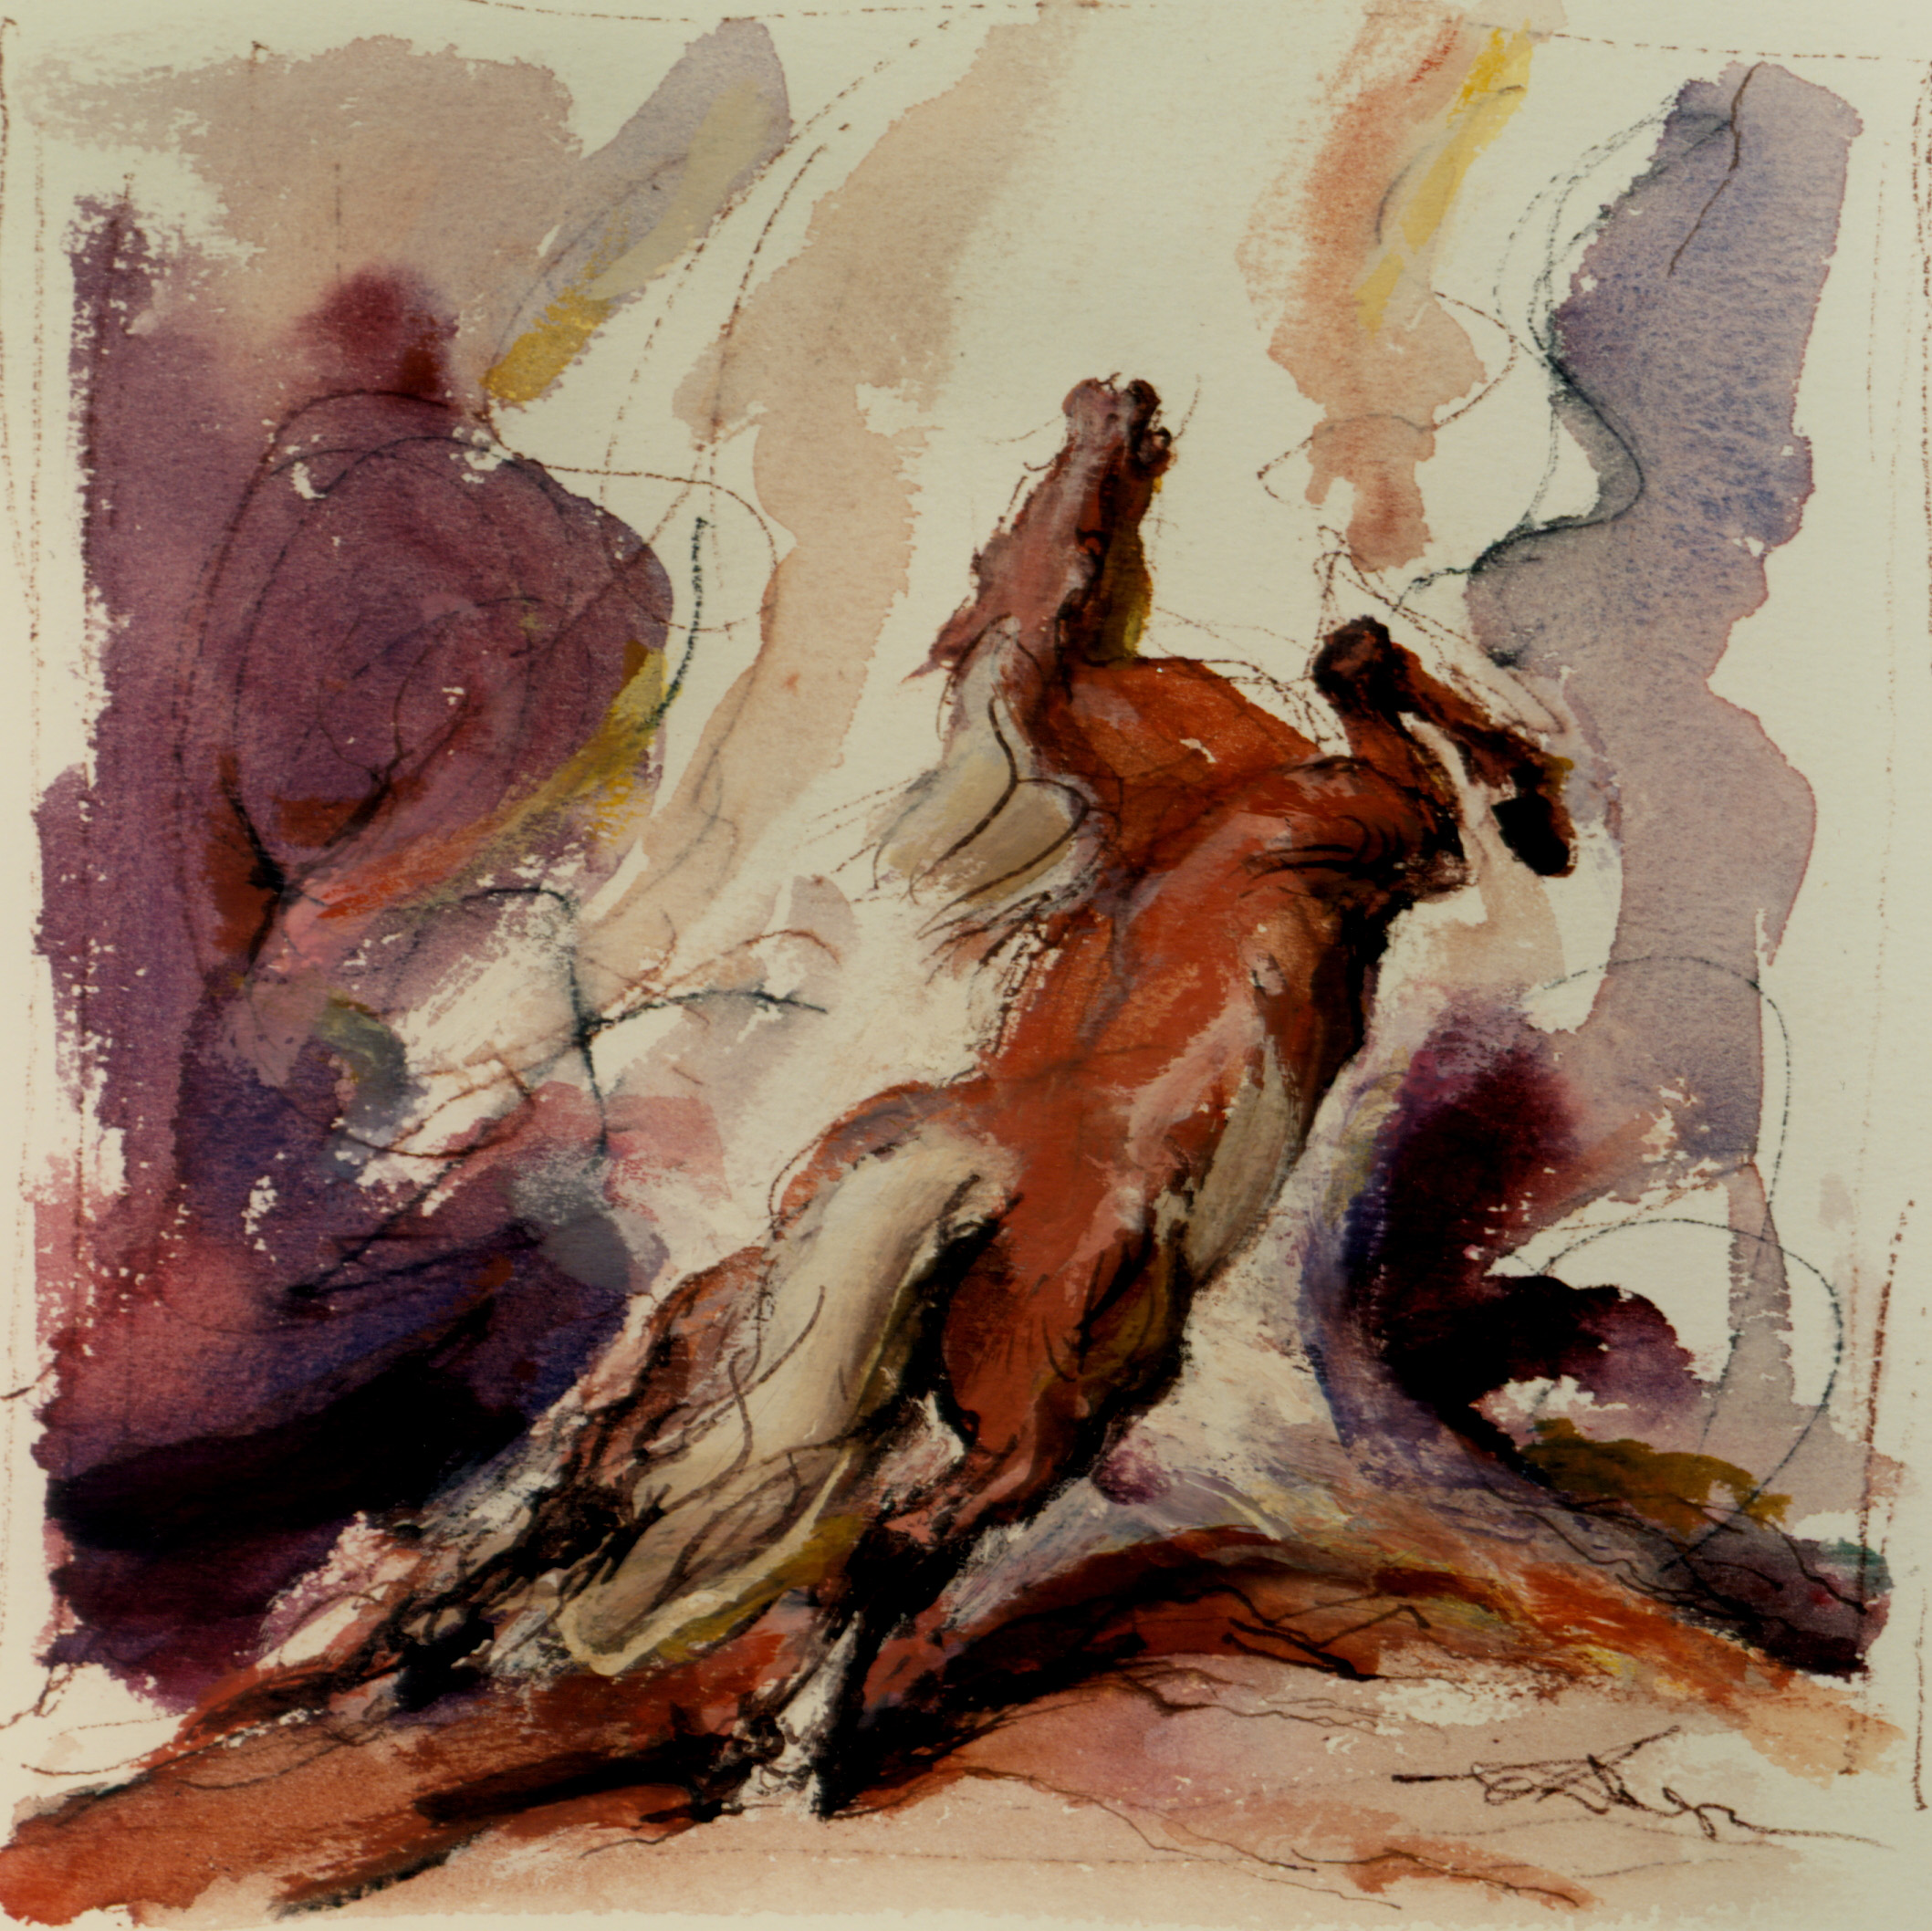 (Watercolor, Gouache, 8 x 8 in.)